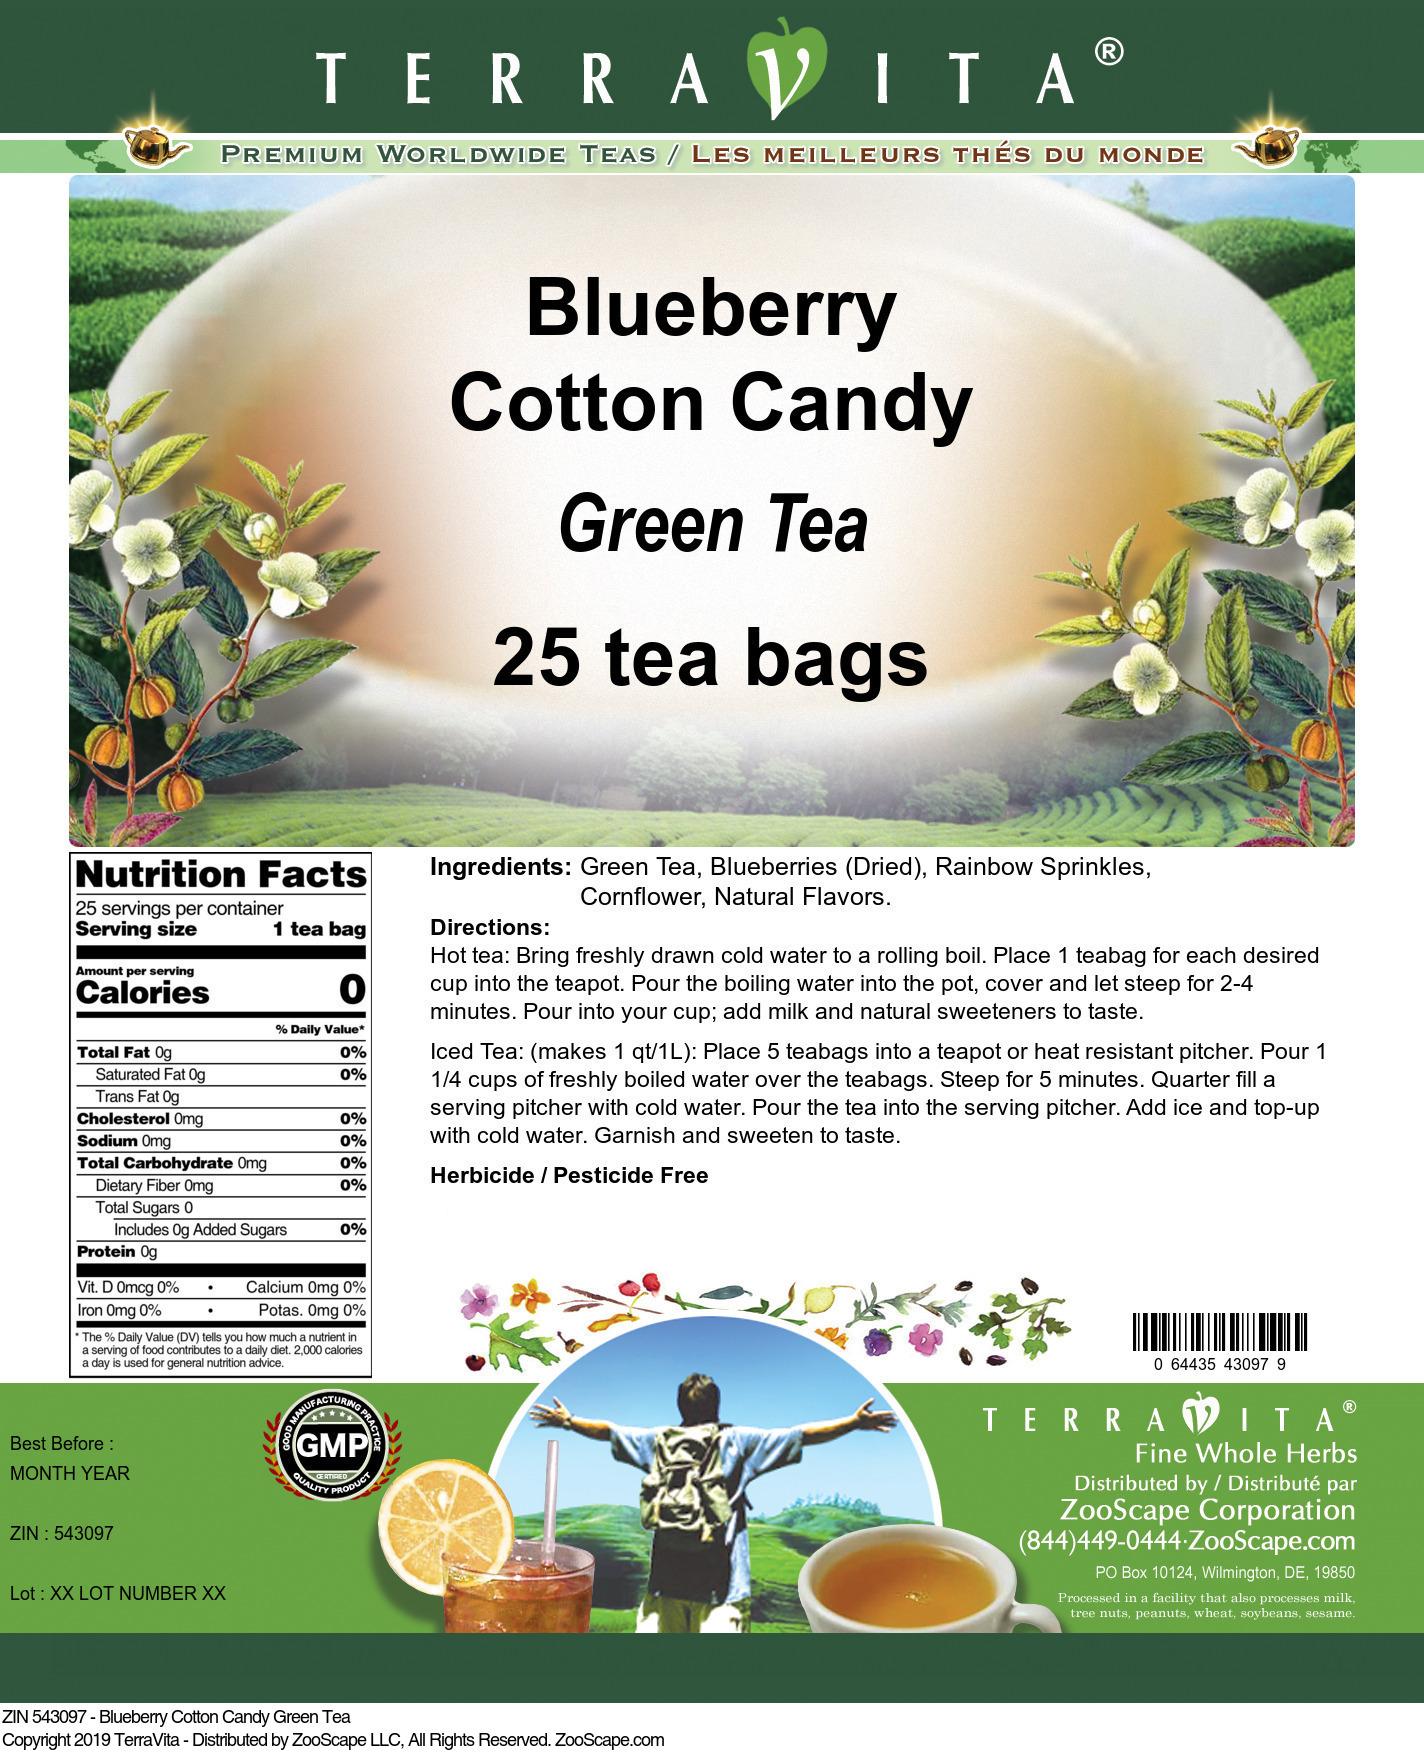 Blueberry Cotton Candy Green Tea